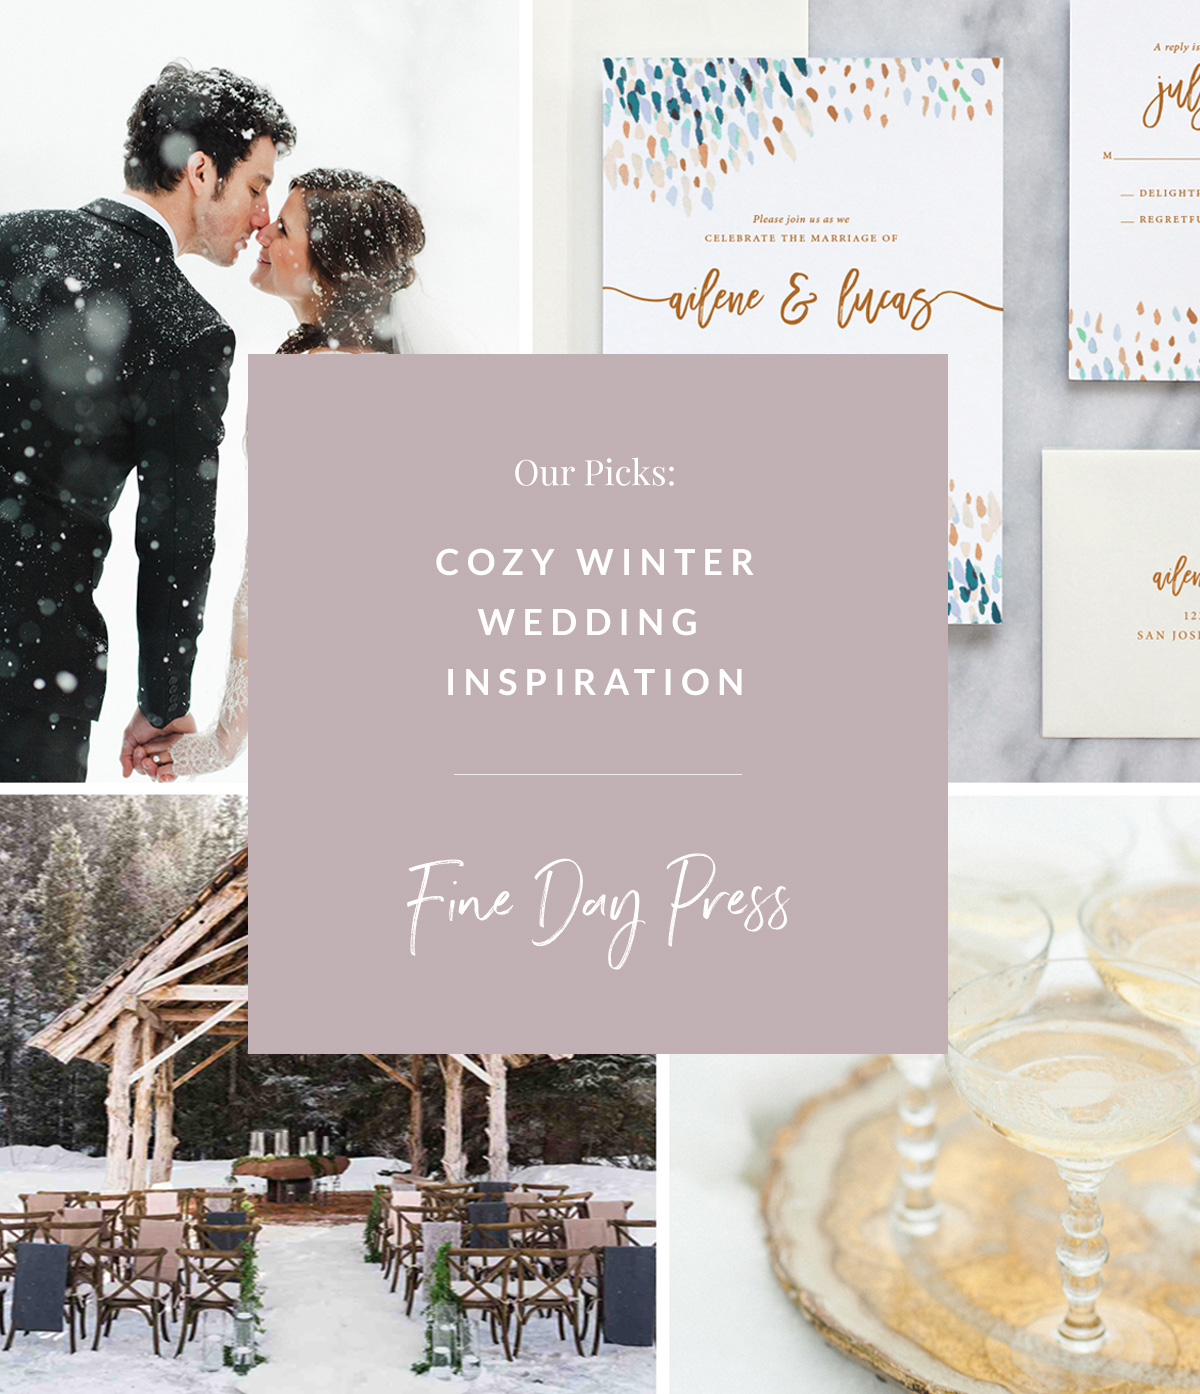 Wedding Ideas And Inspirations: Romantic Winter Wedding Inspiration